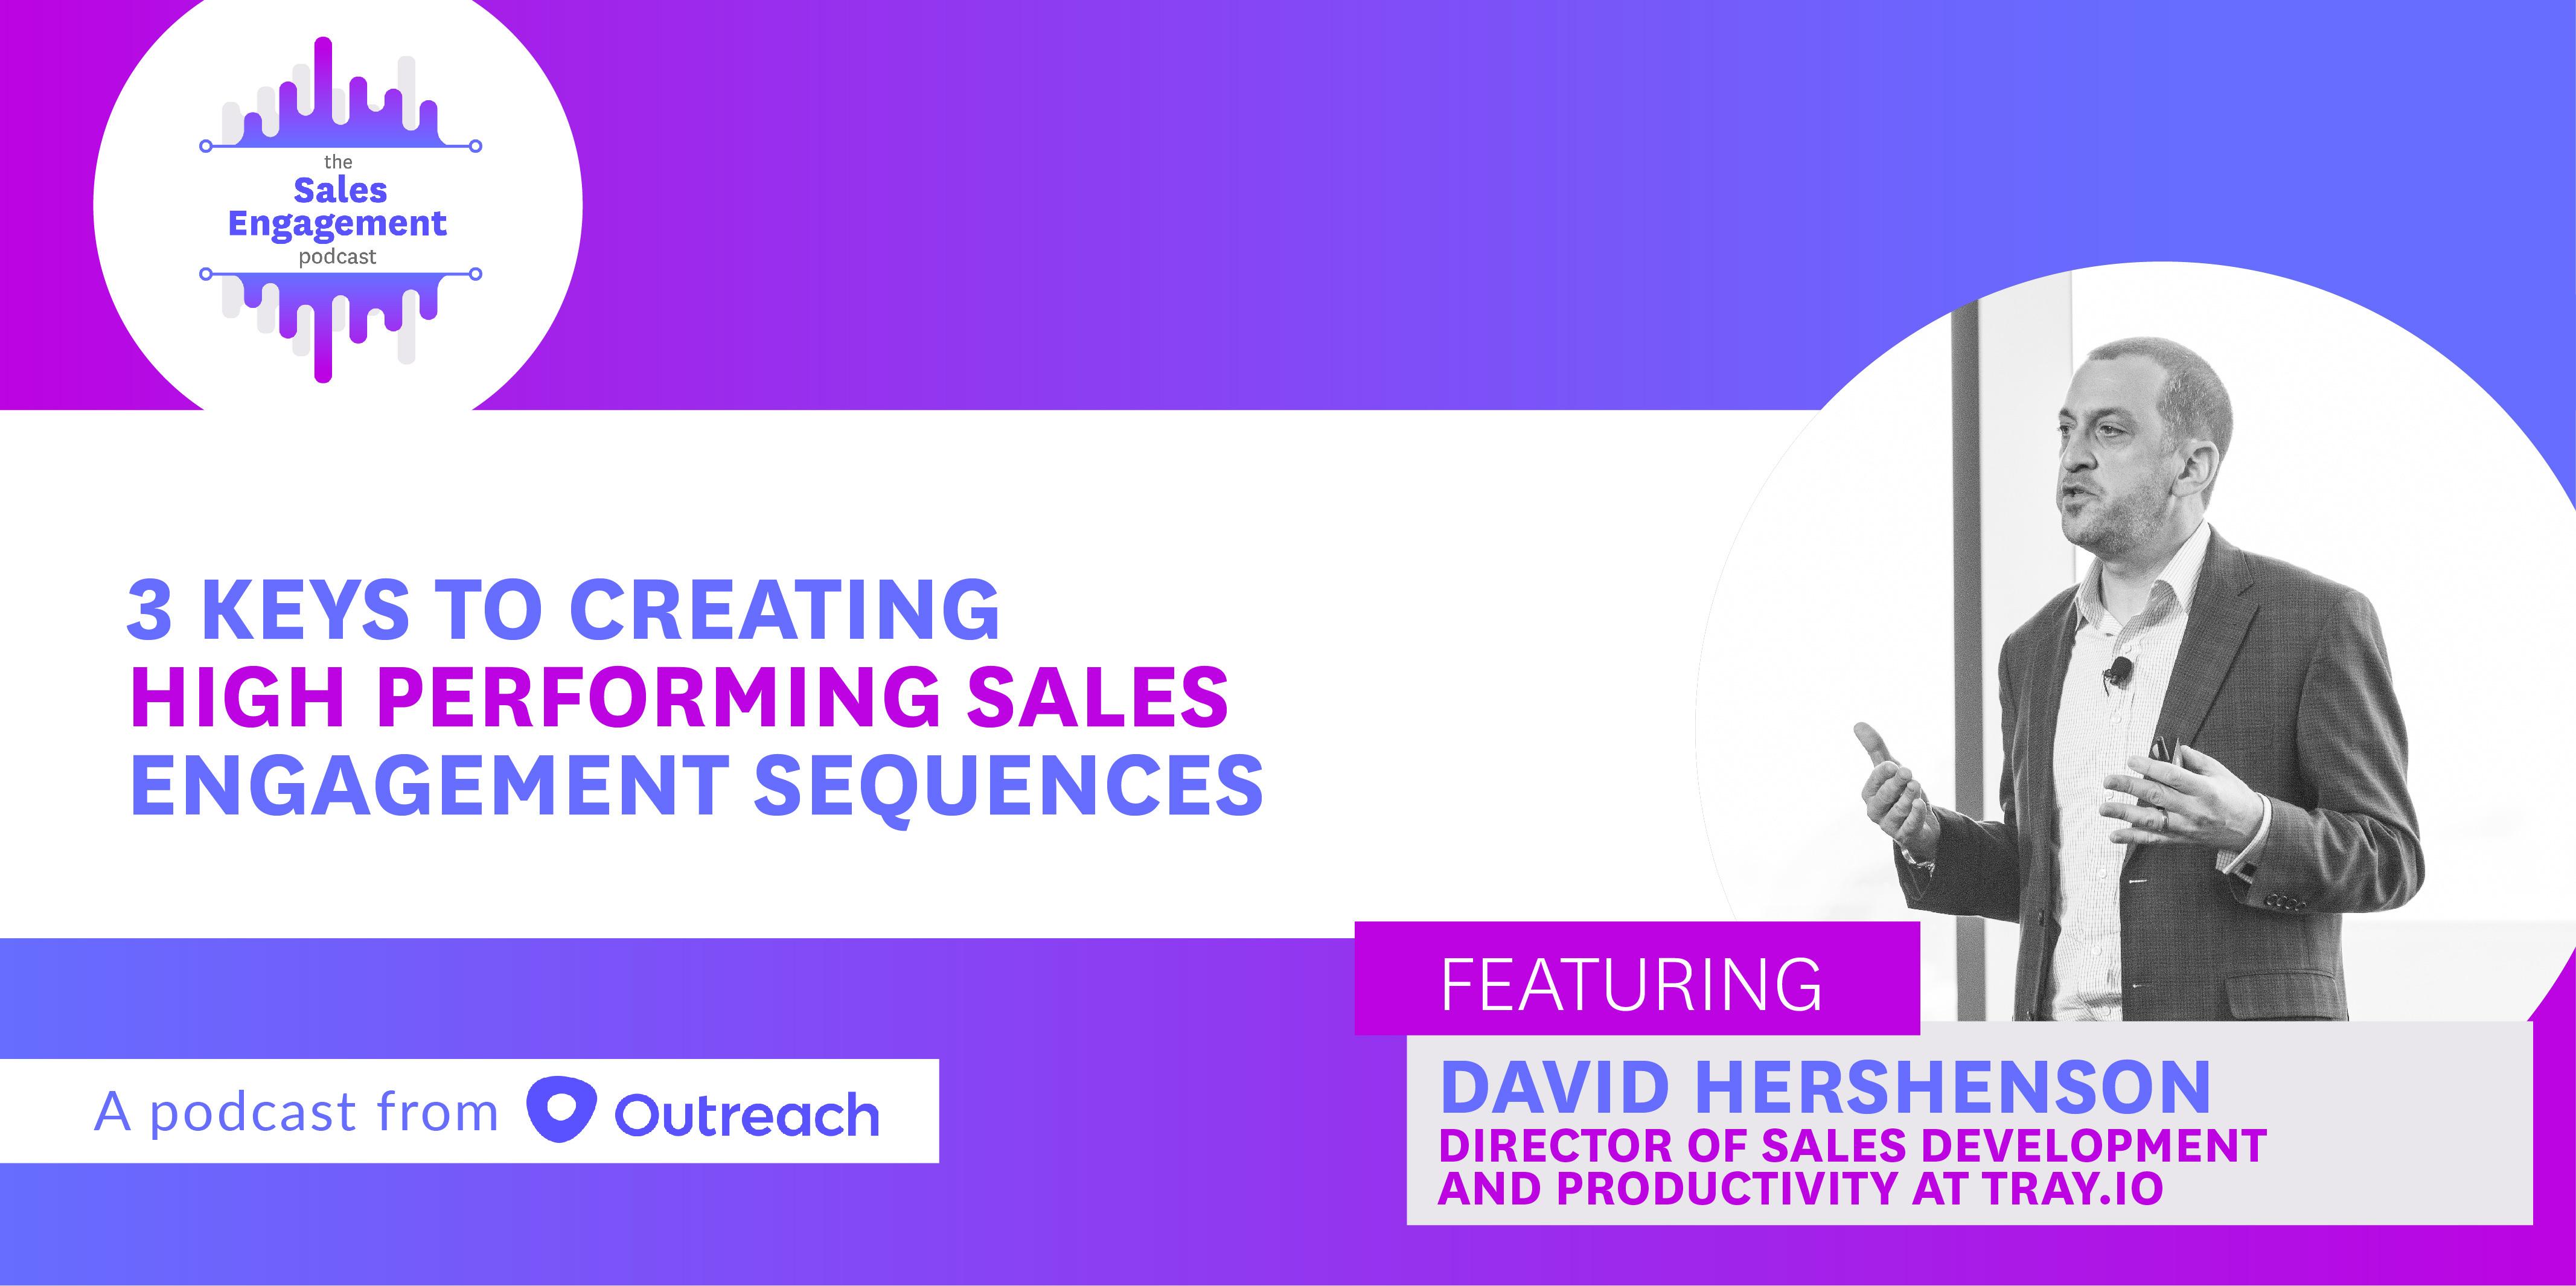 The_Sales_Engagement_Podcast_EP_74_April_1_-_David_Hershenson_Tray.io-01.jpg#asset:9828